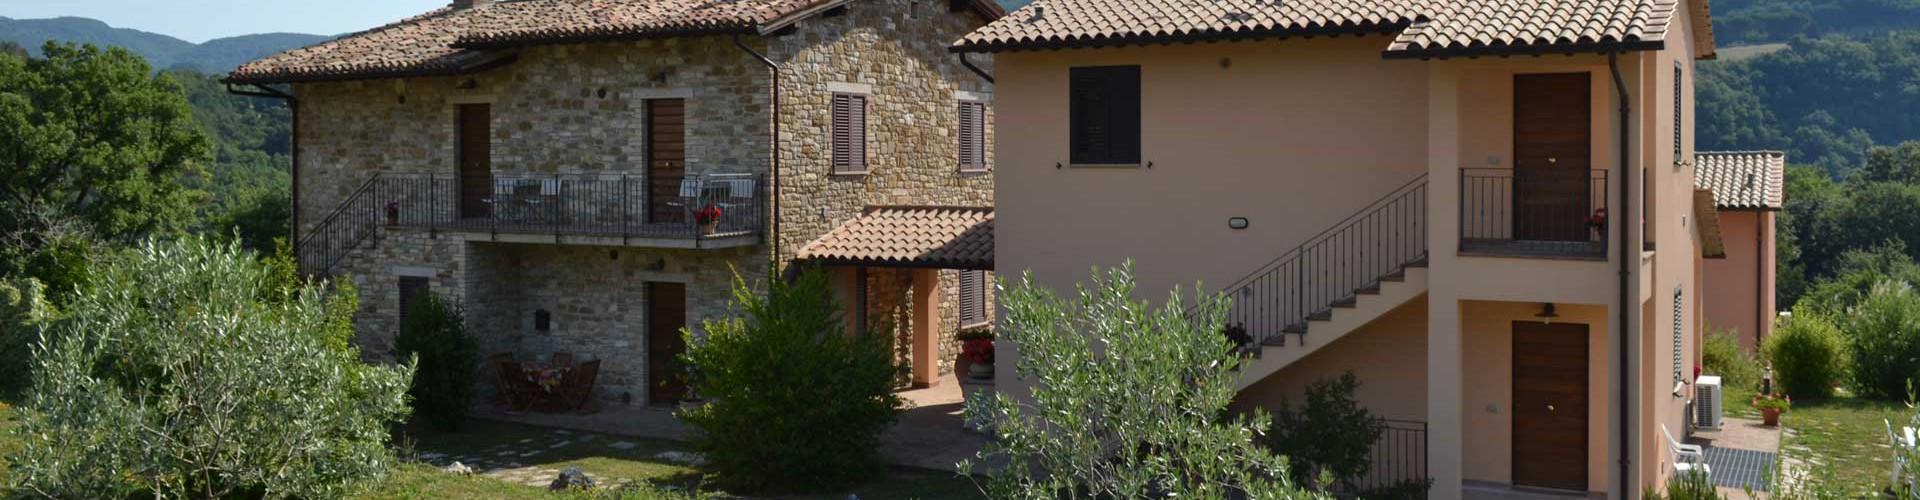 Relais Parco del Subasio | Agriturismo Assisi - OPfferte Speciali Featured Image